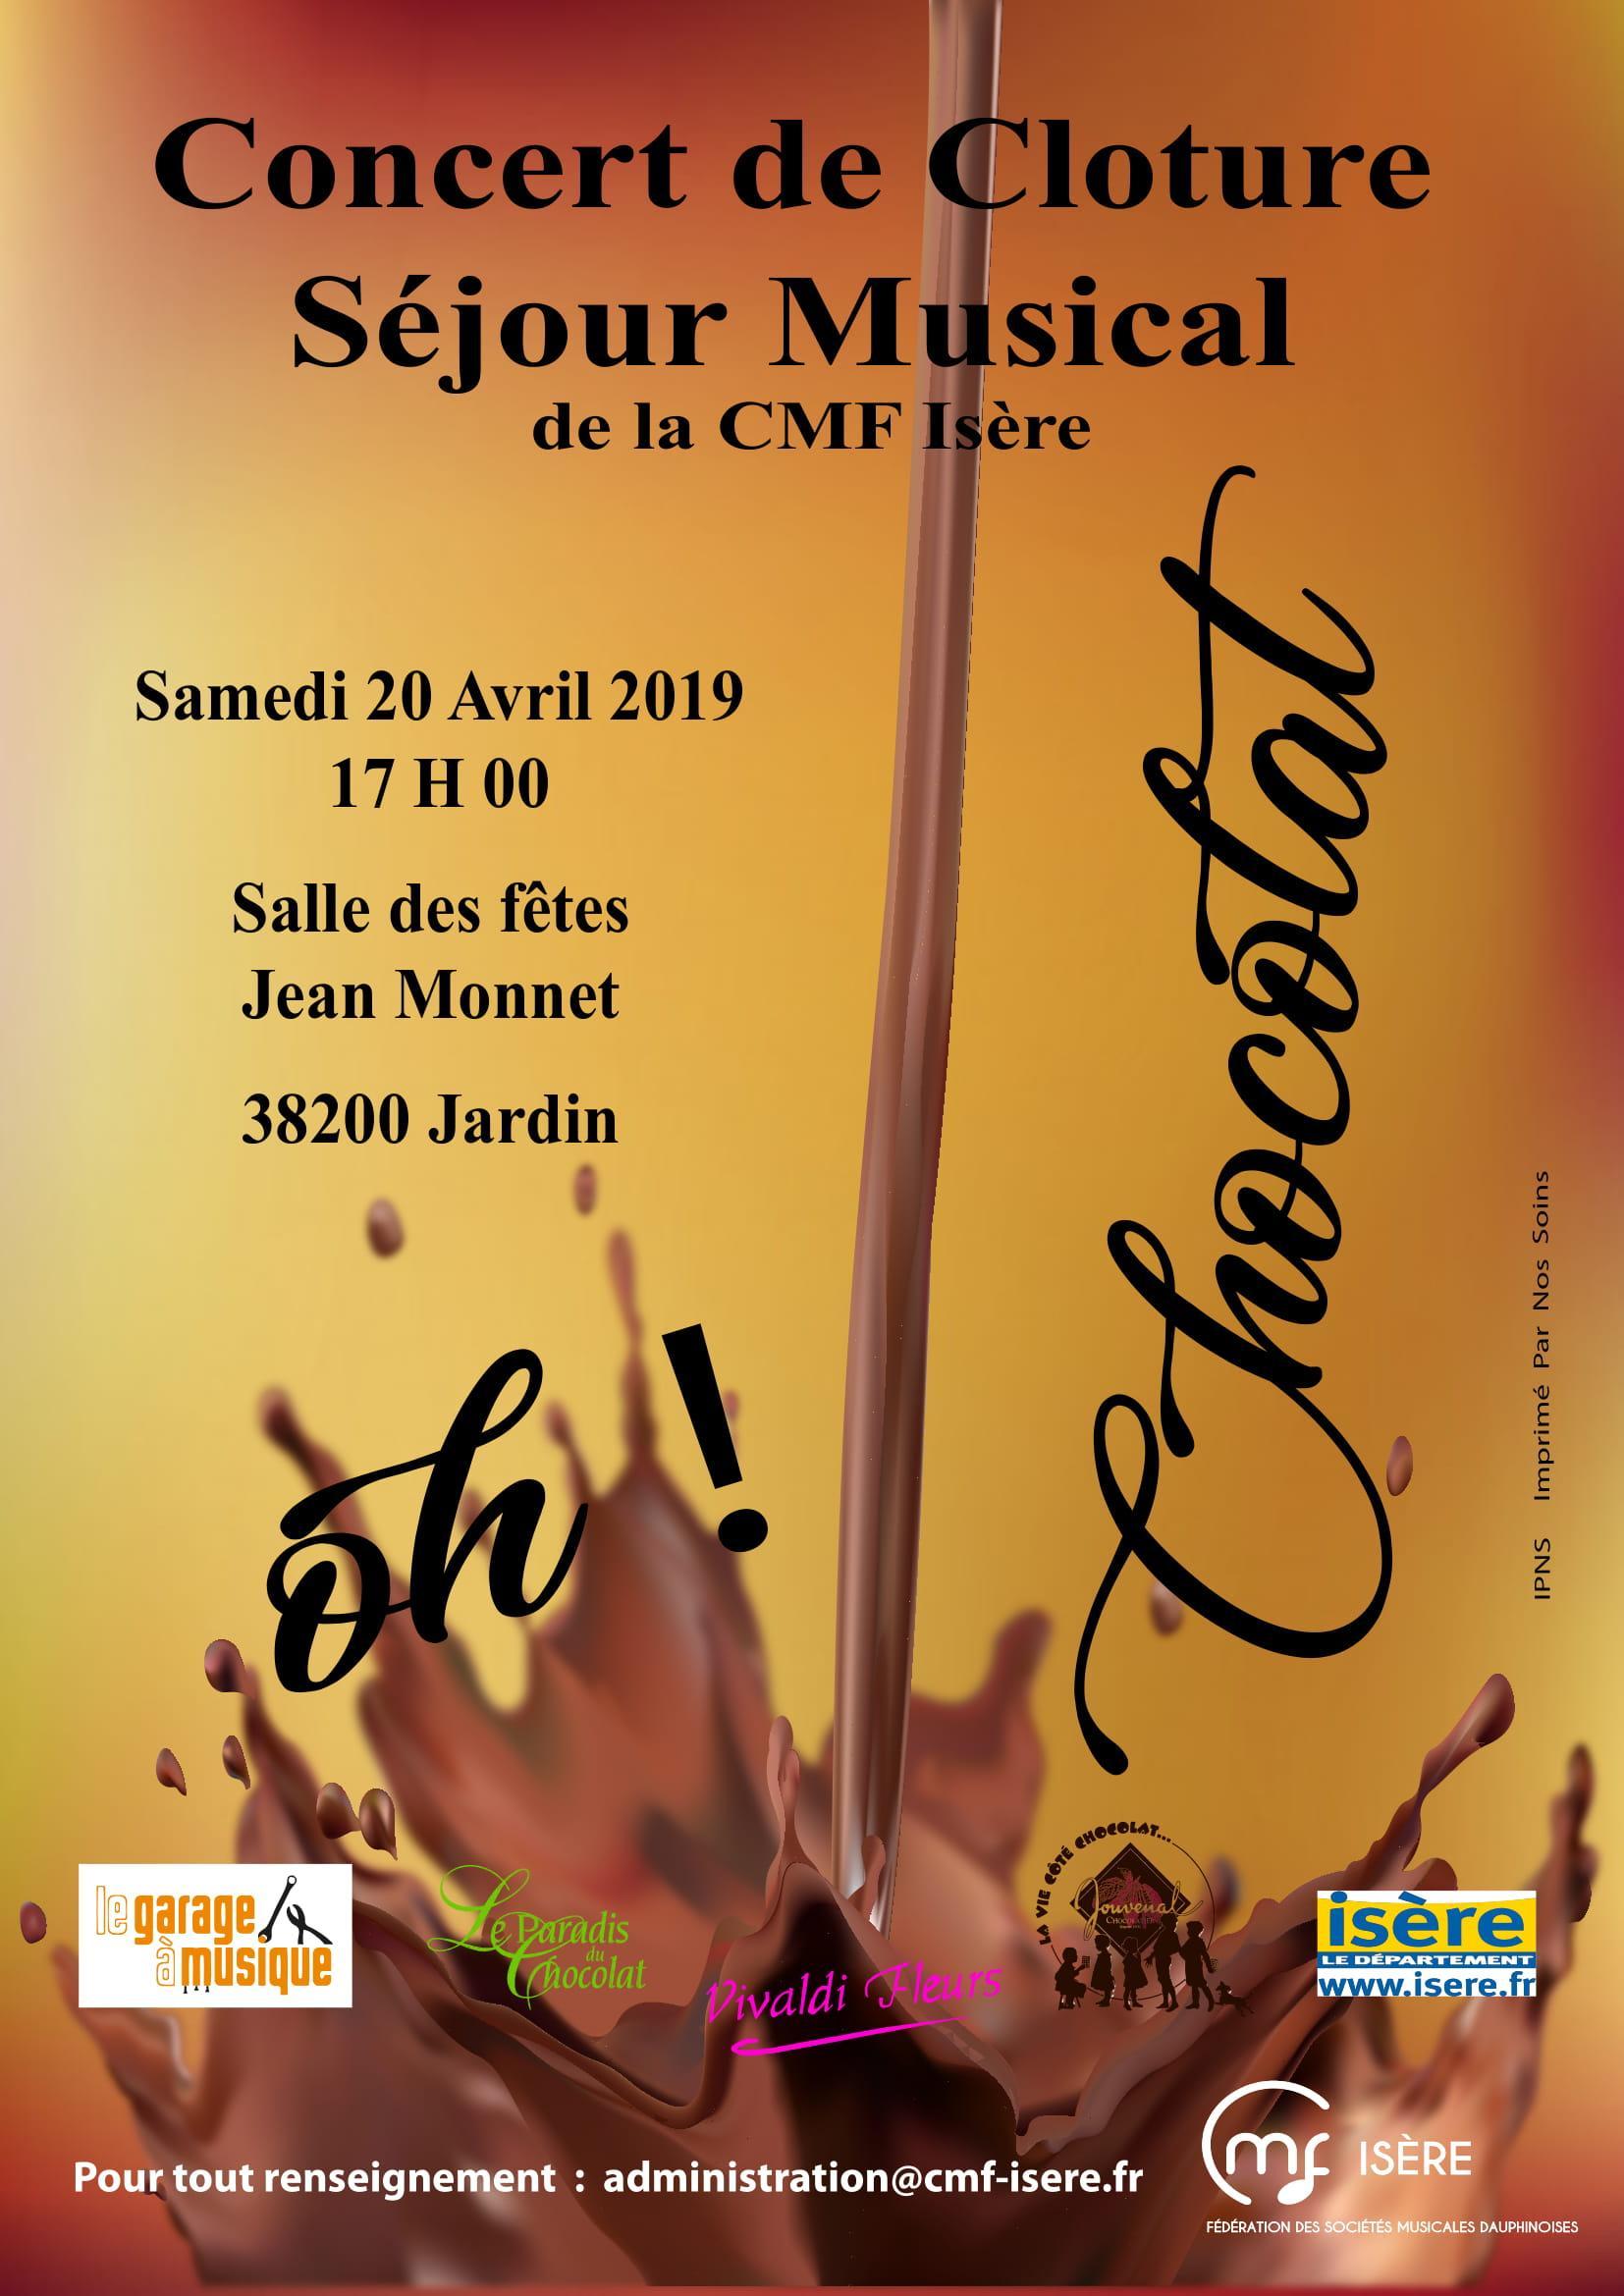 Affiche concert sejour musical CMF Isere 2019